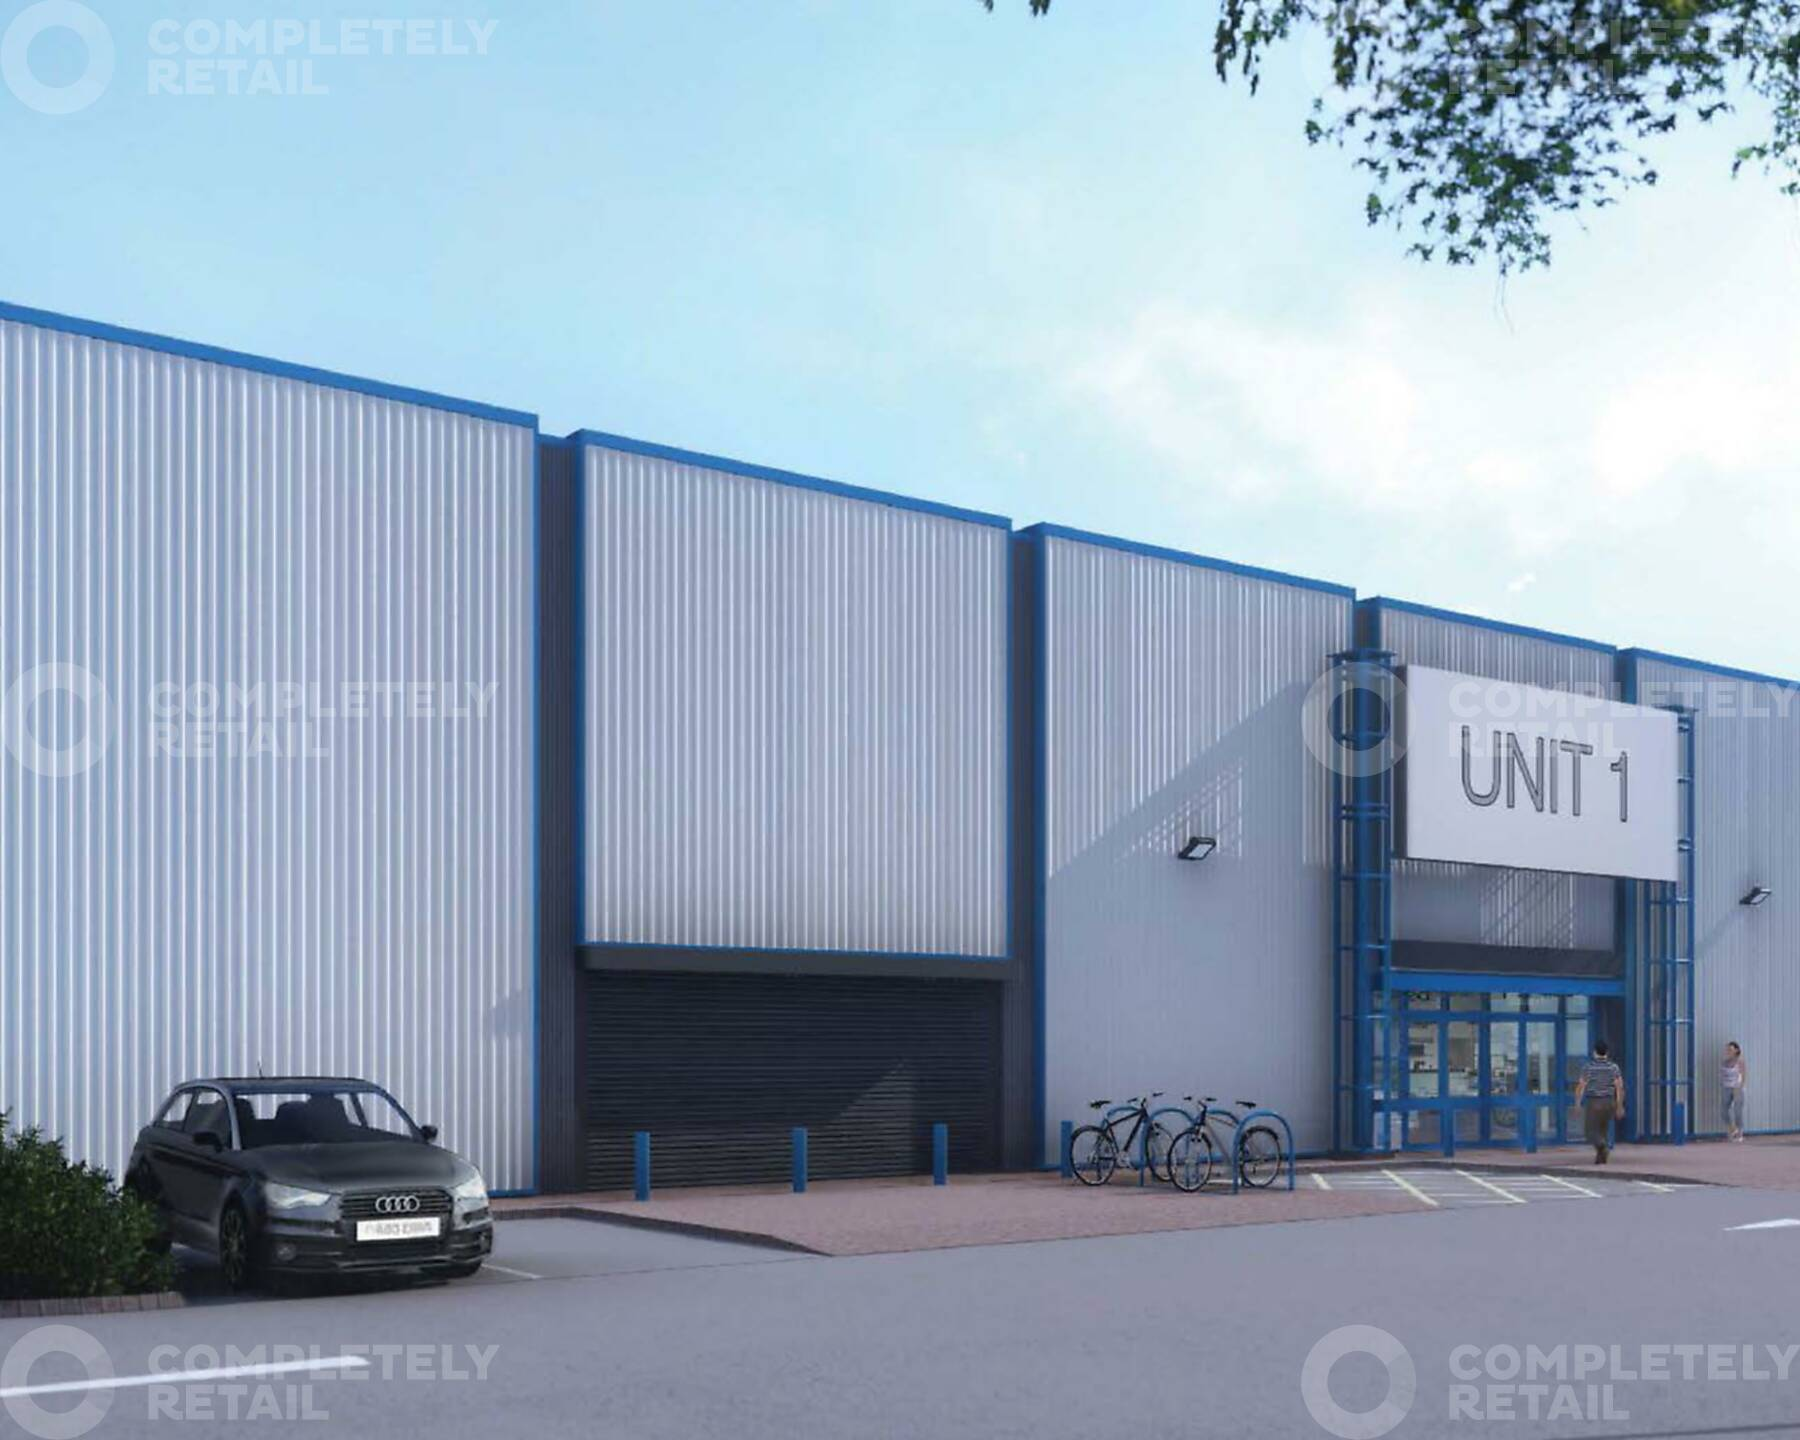 Retail Warehouse Unit